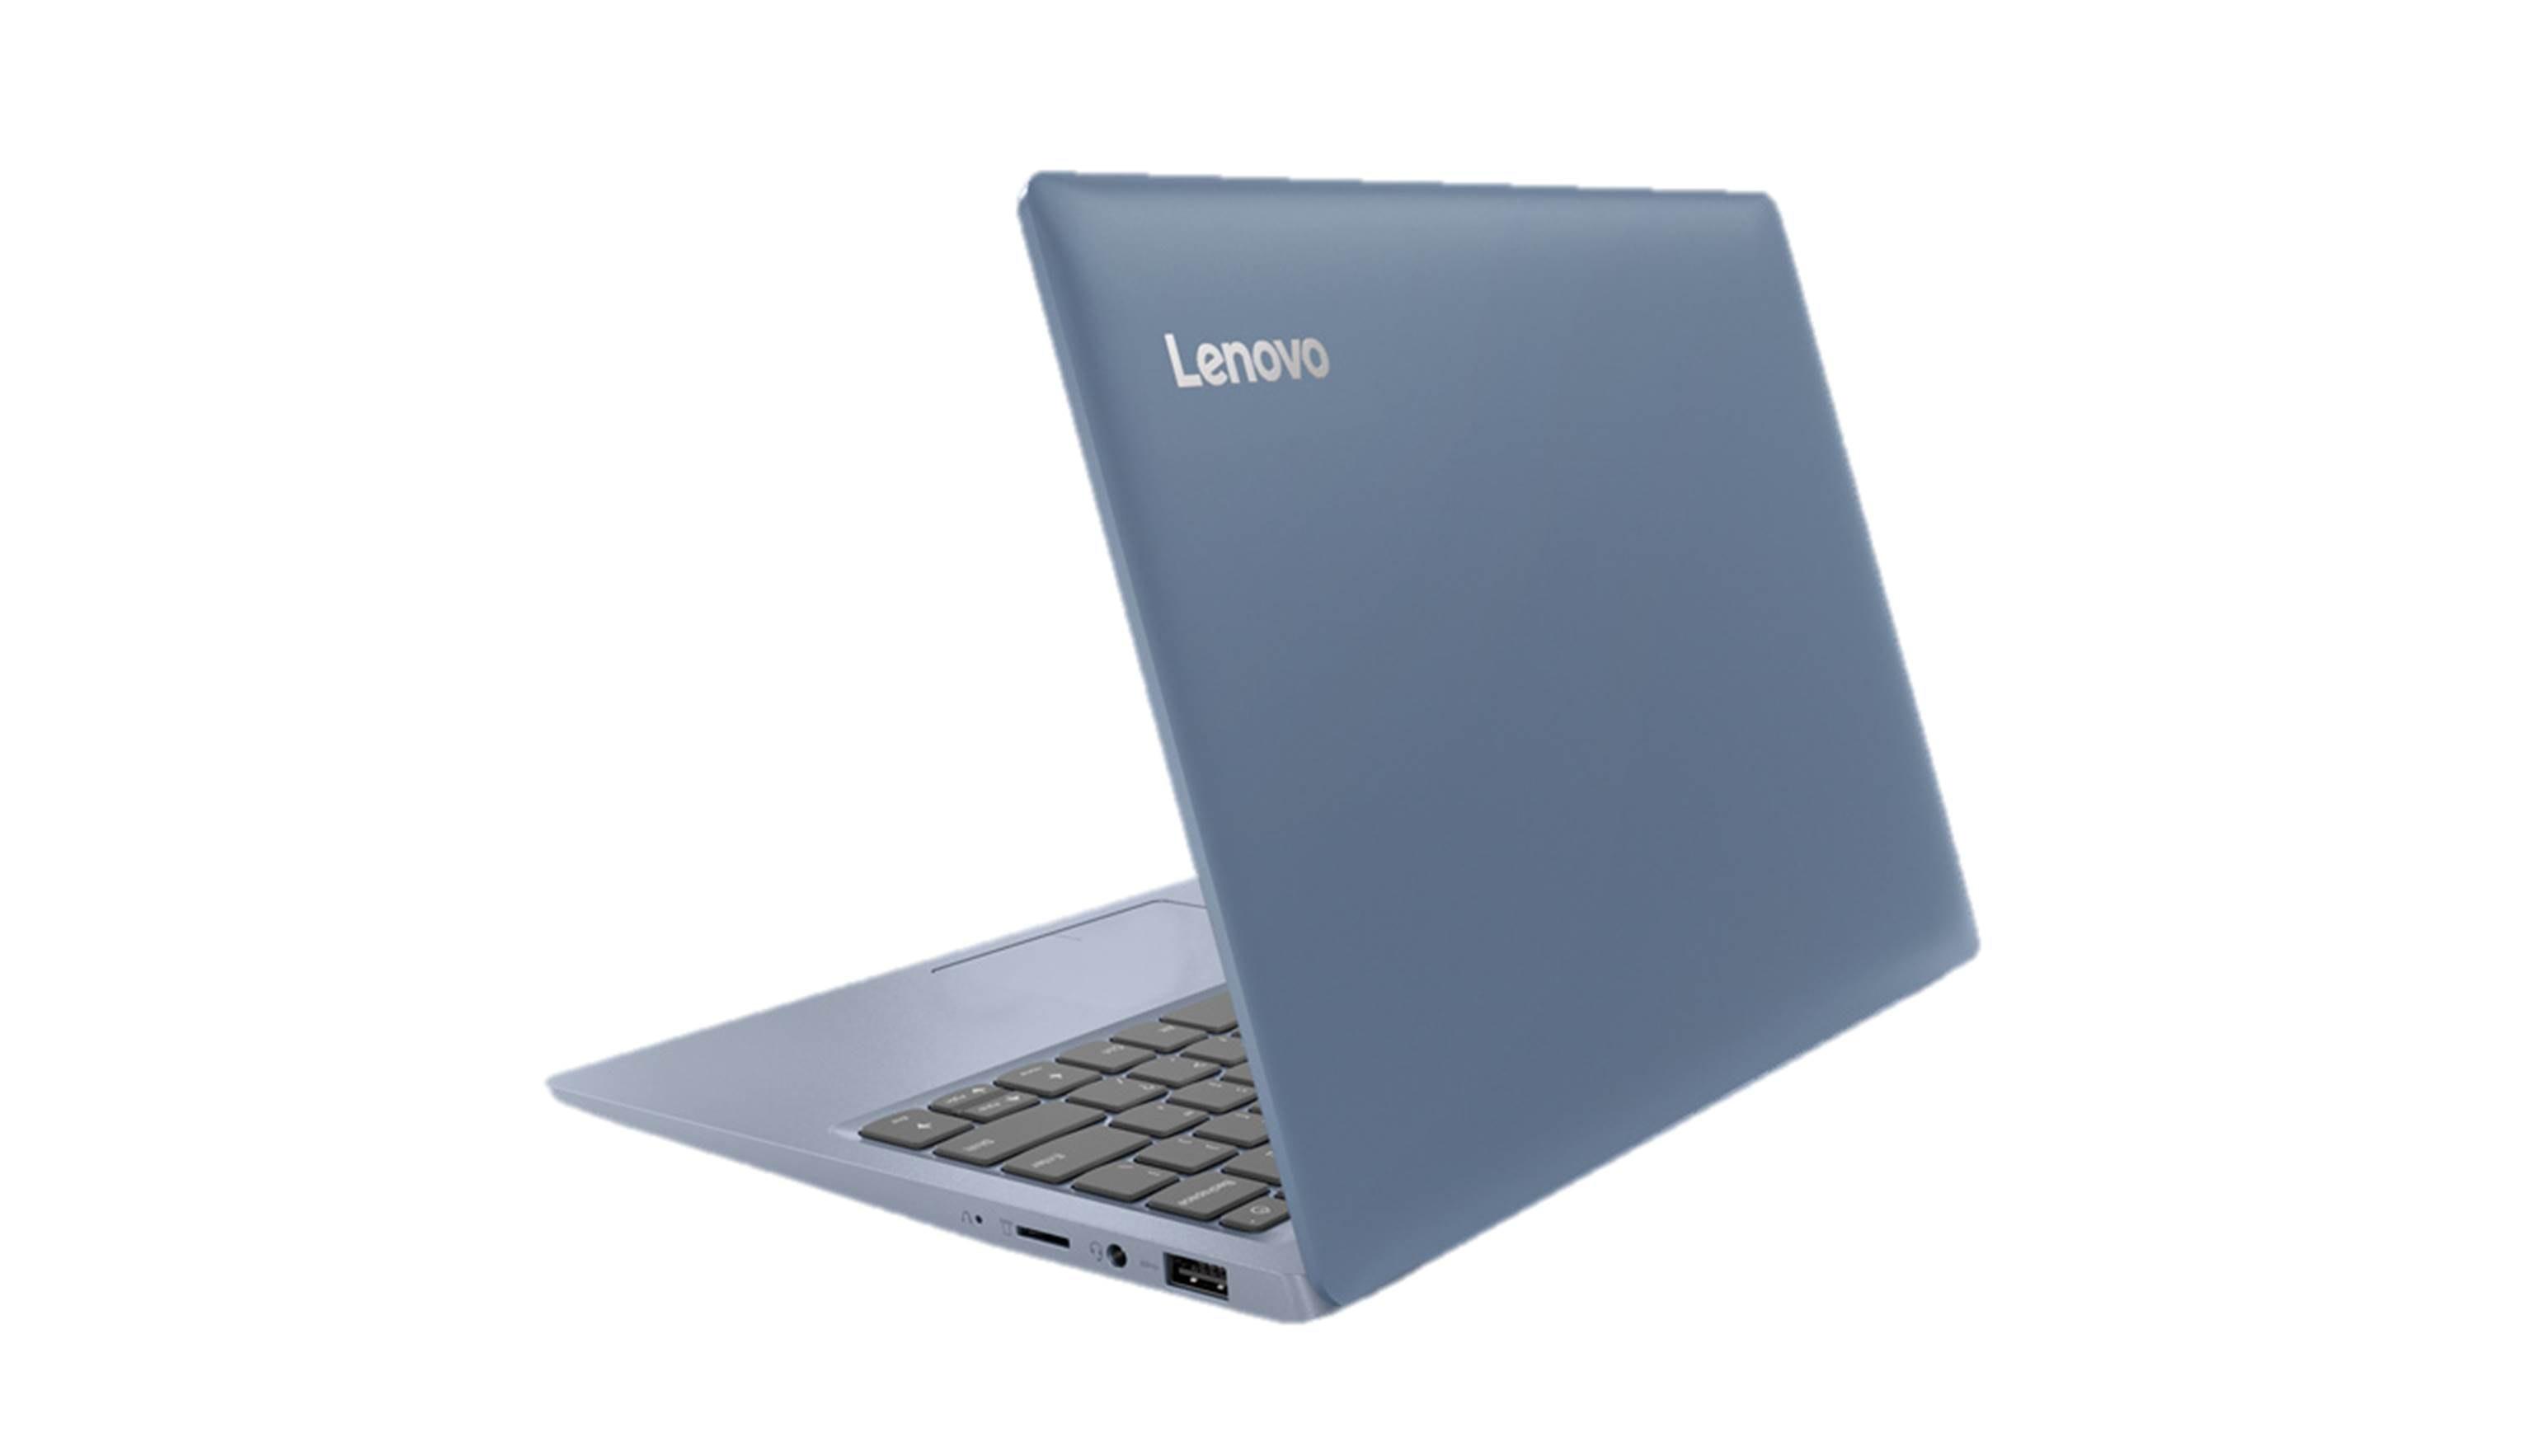 Lenovo Ideapad 120s 14 Quot 4gb Ram Denim Blue Harvey